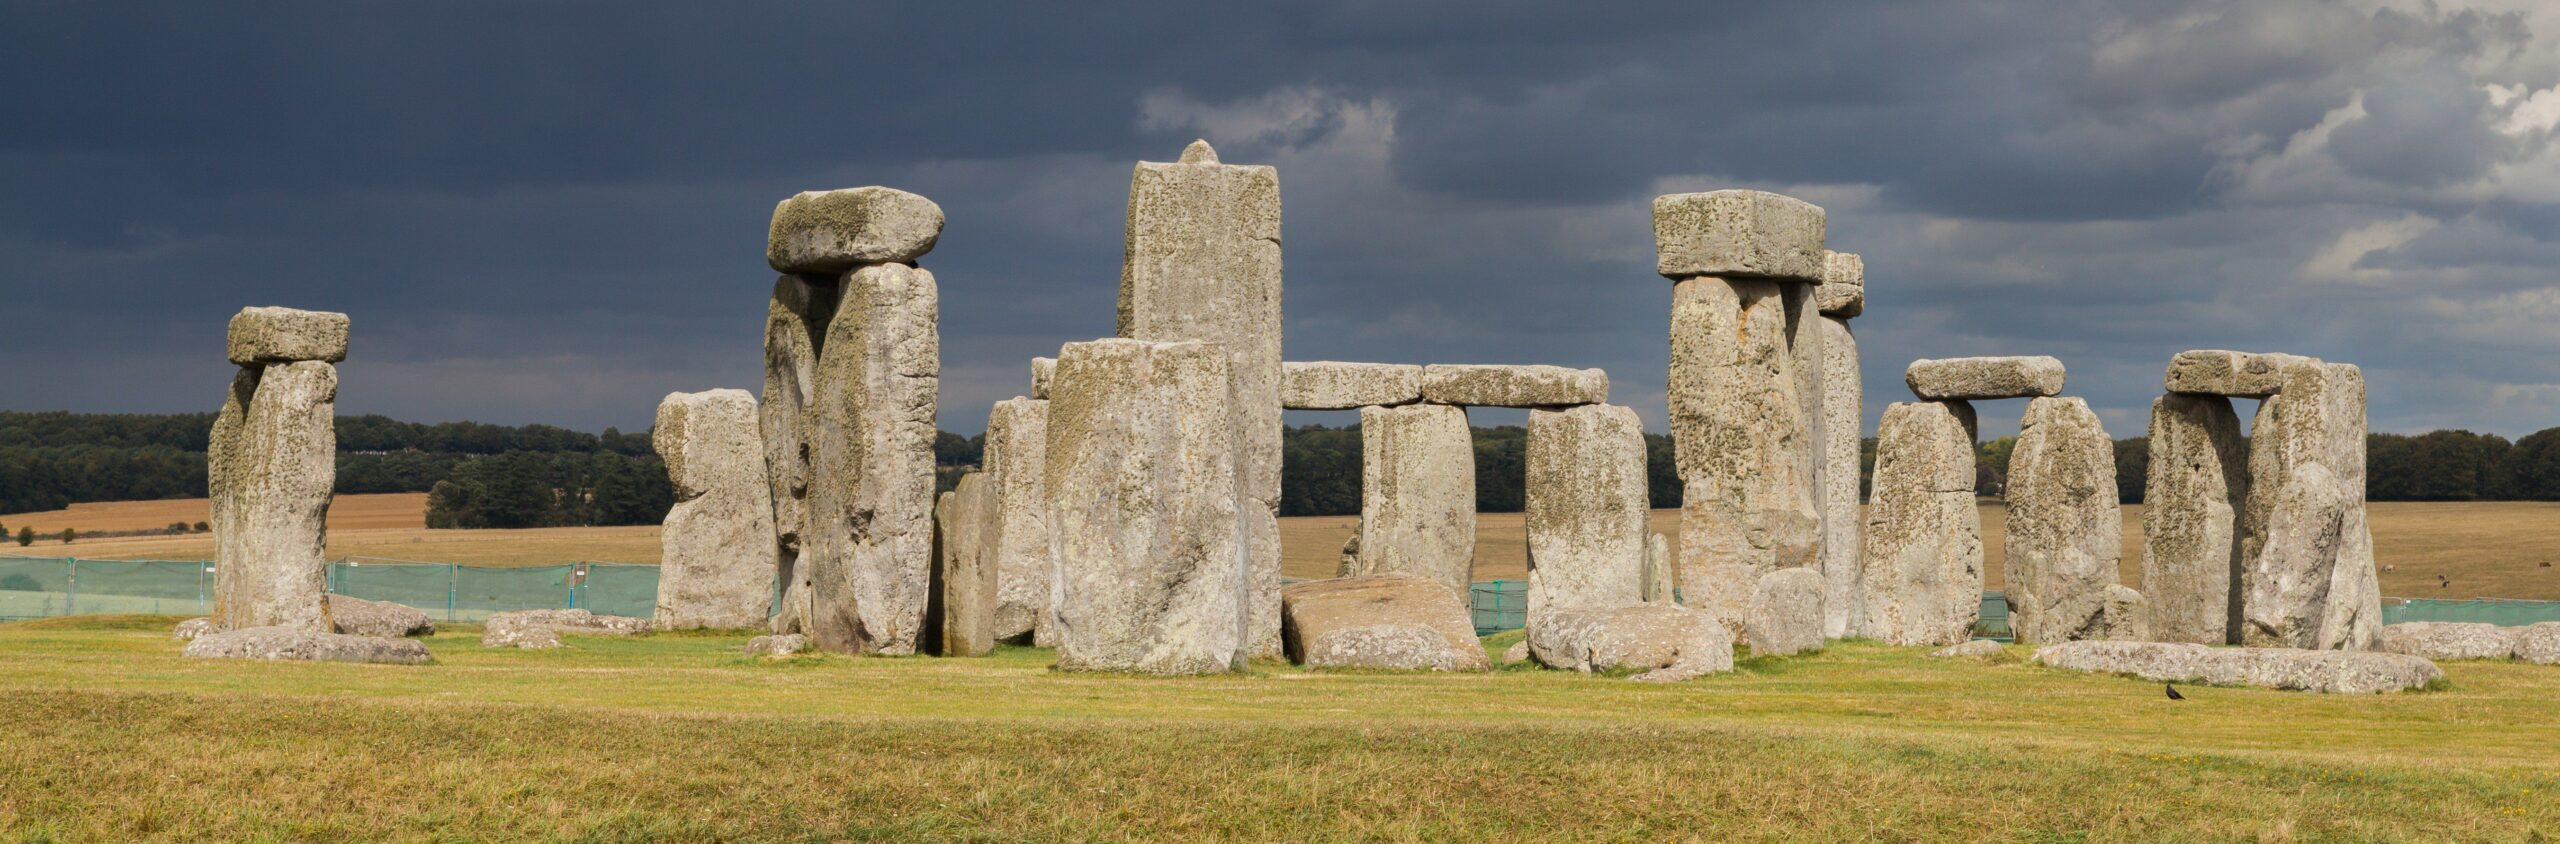 Visita a Stonehenge: come arrivare da Londra